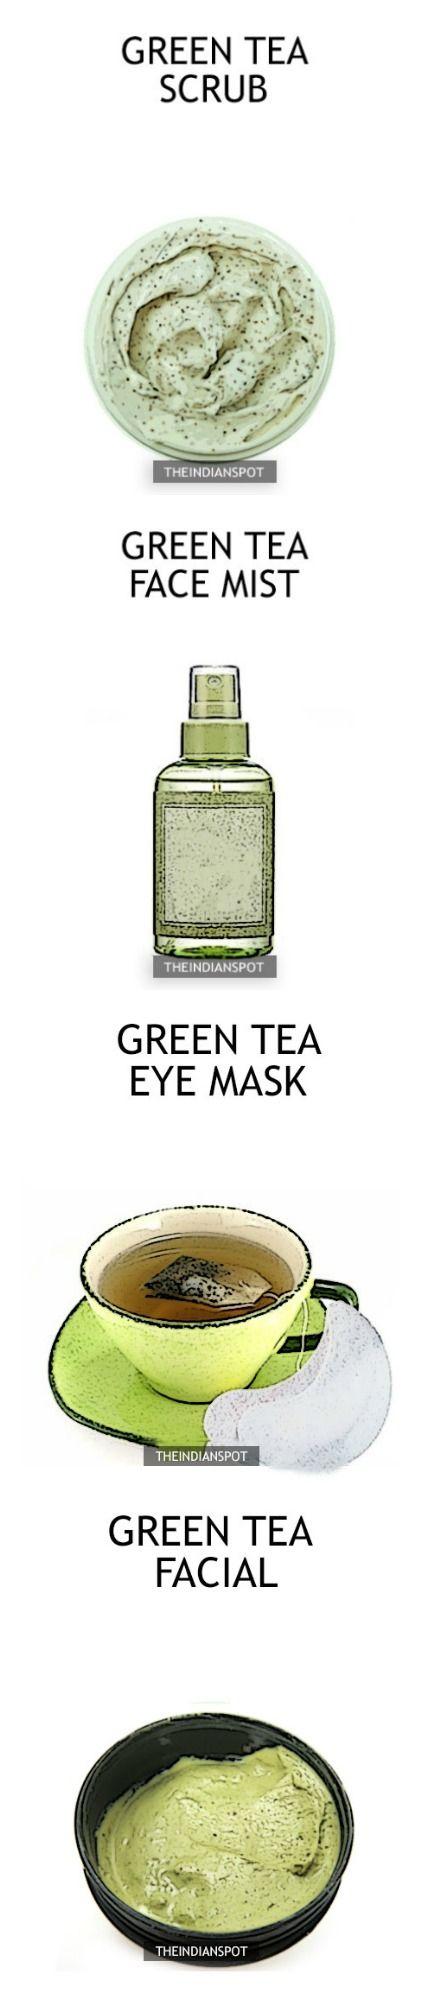 Amazing Beauty DIYs using Green Tea - THEINDIANSPOT - Page 5